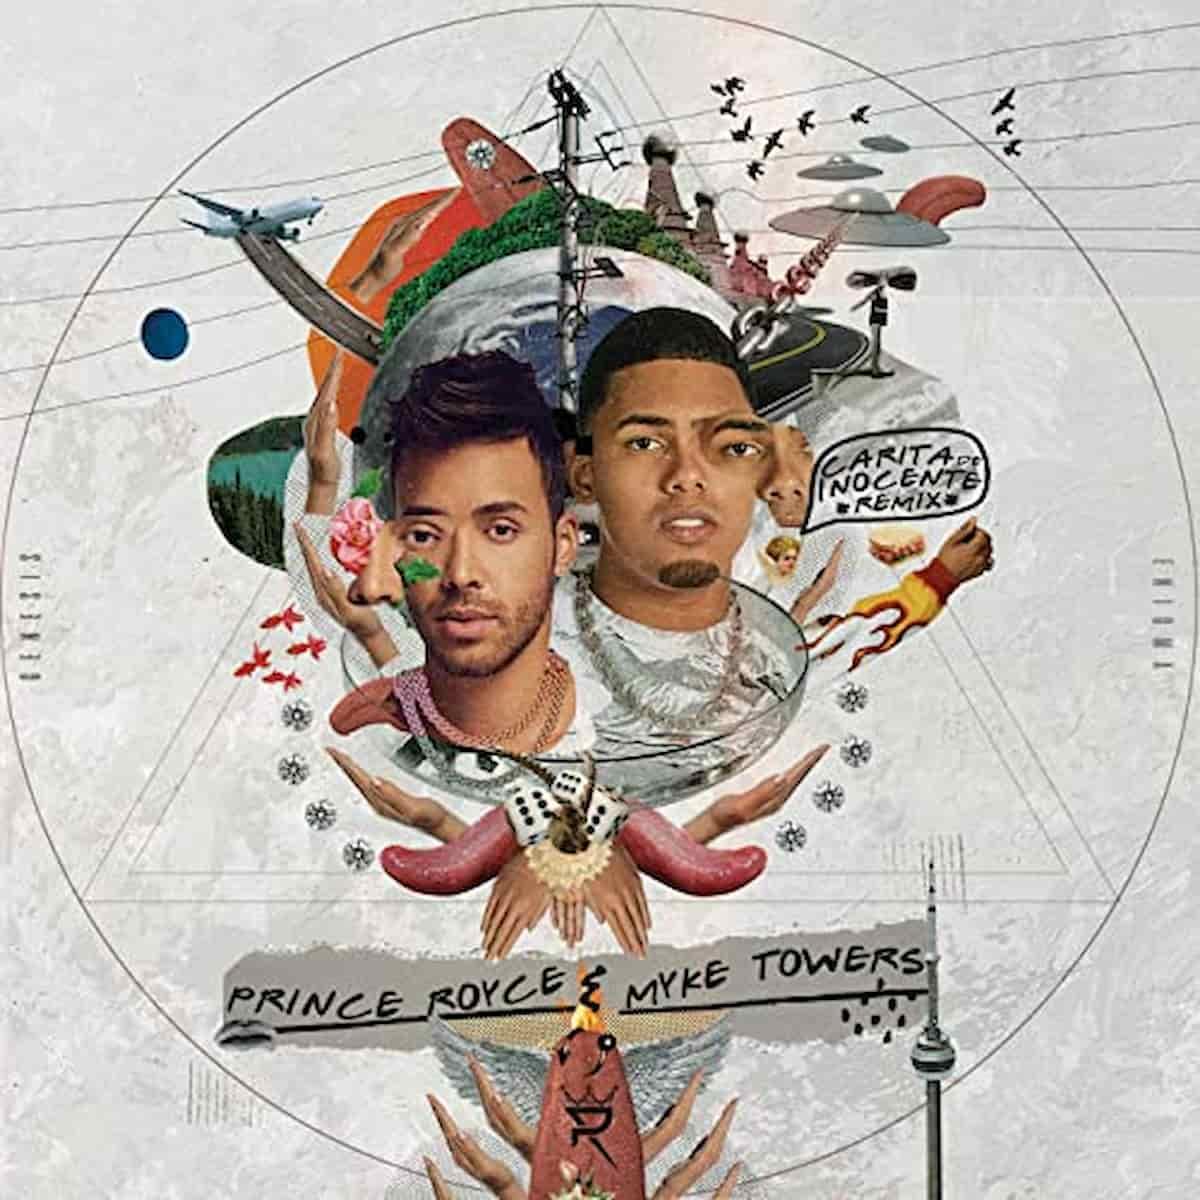 Prince Royce ft. Myke Towers - neuer Bachata-Remix von Carita de Inocente